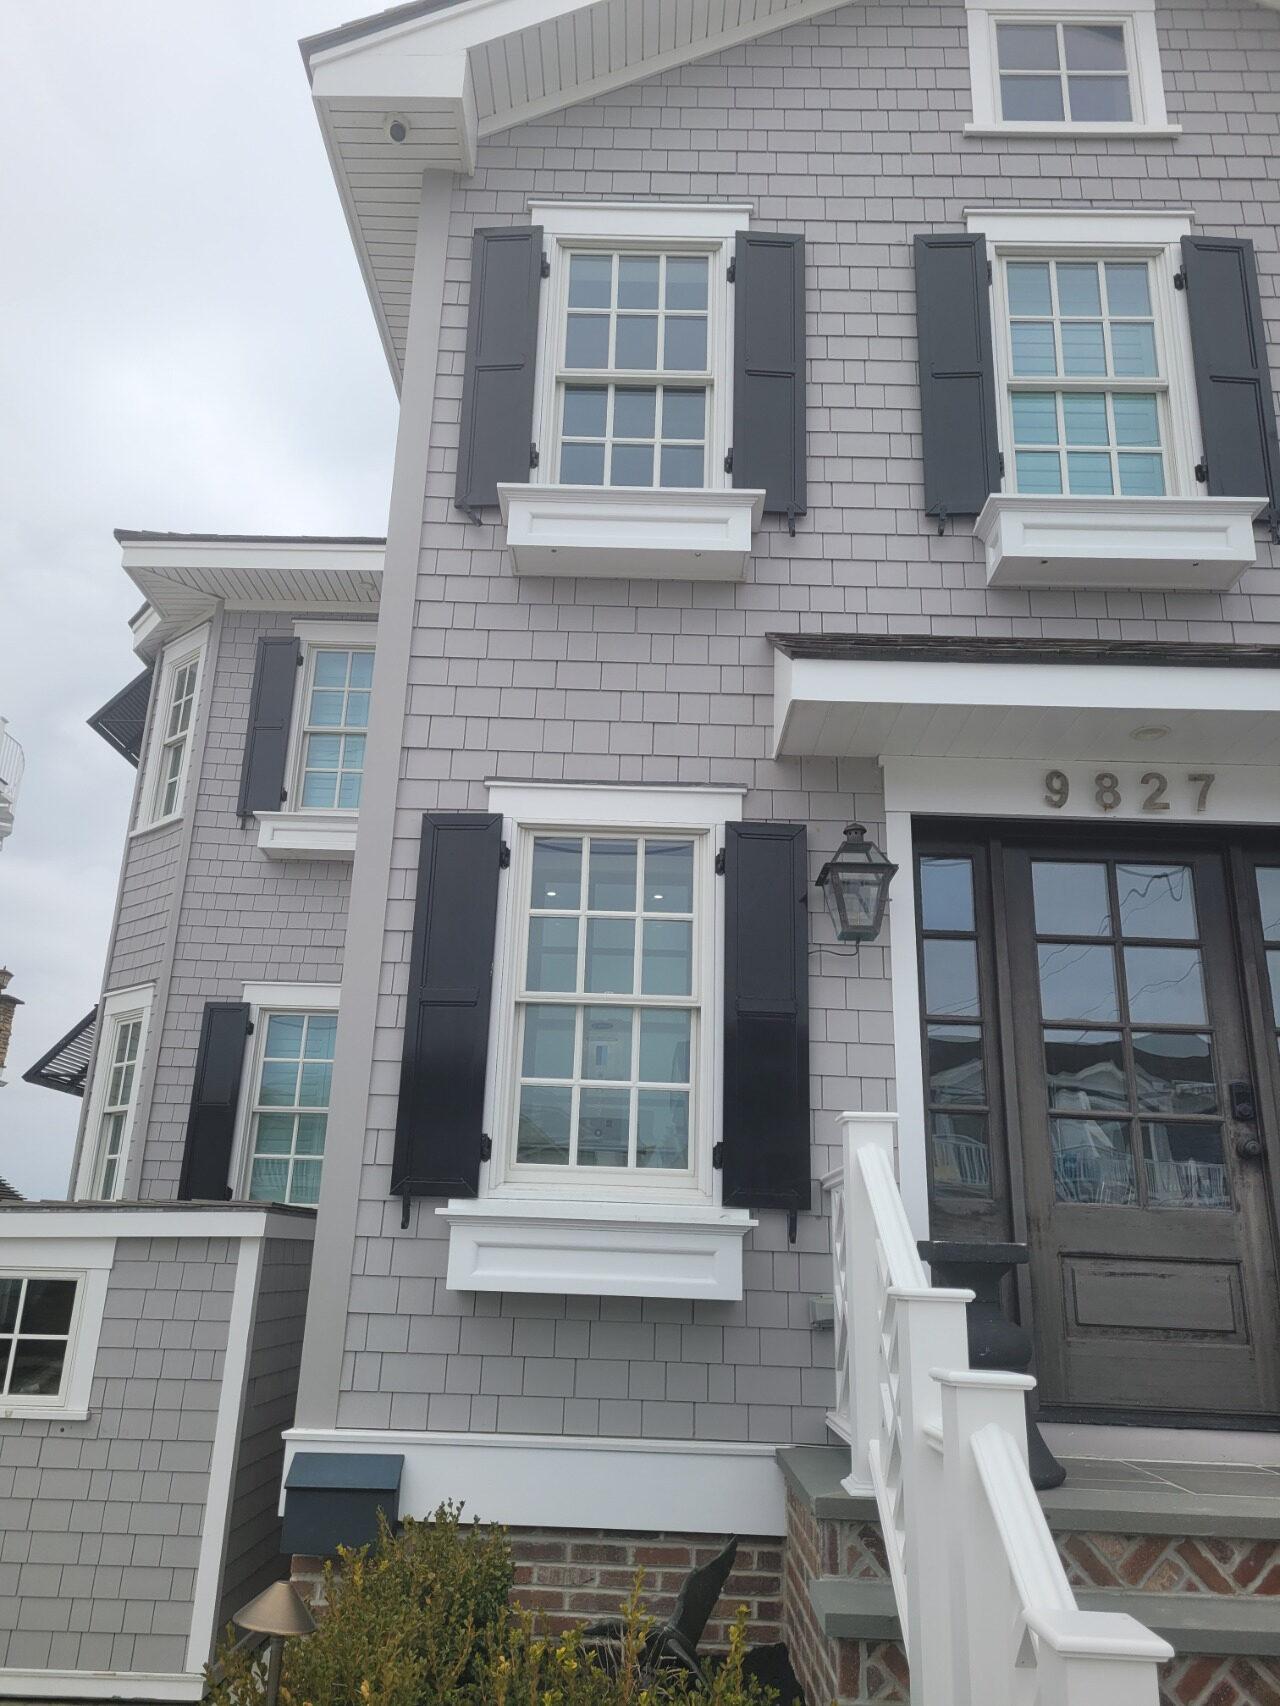 New Residential Elevator Installation In Stone Harbor NJ